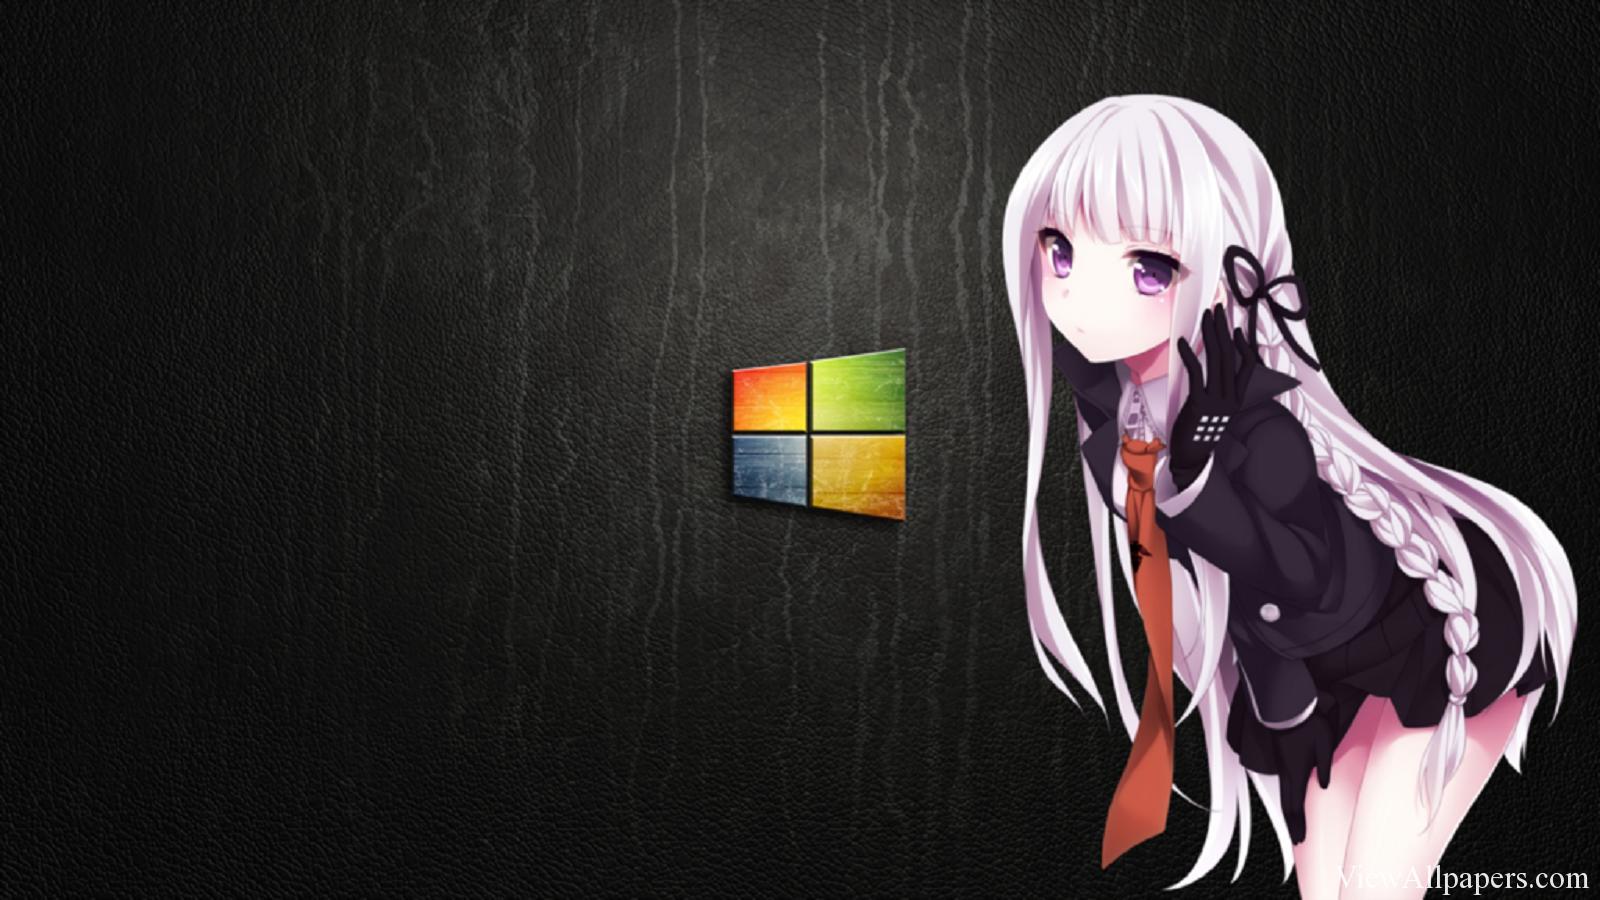 Windows Anime High Resolution Wallpaper download Windows Anime 1600x900